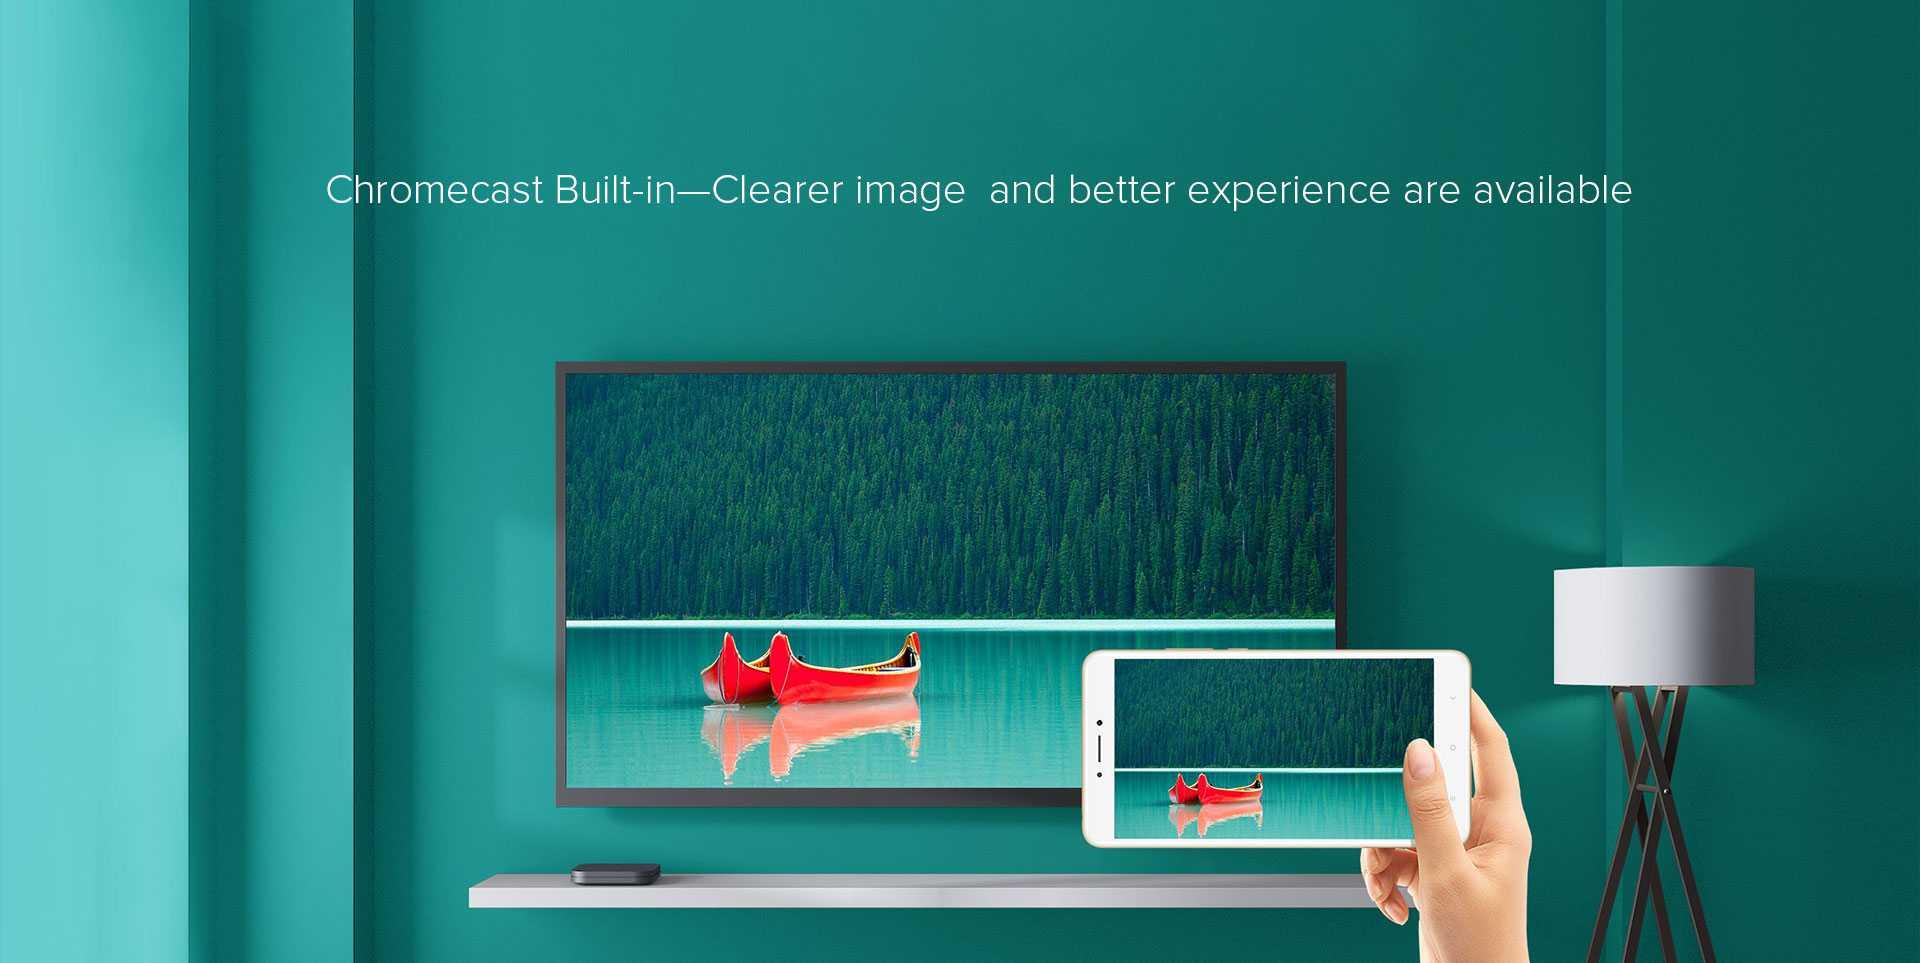 Mi Box s WIFI bluetooth TV Box Streaming Media Player Whosale